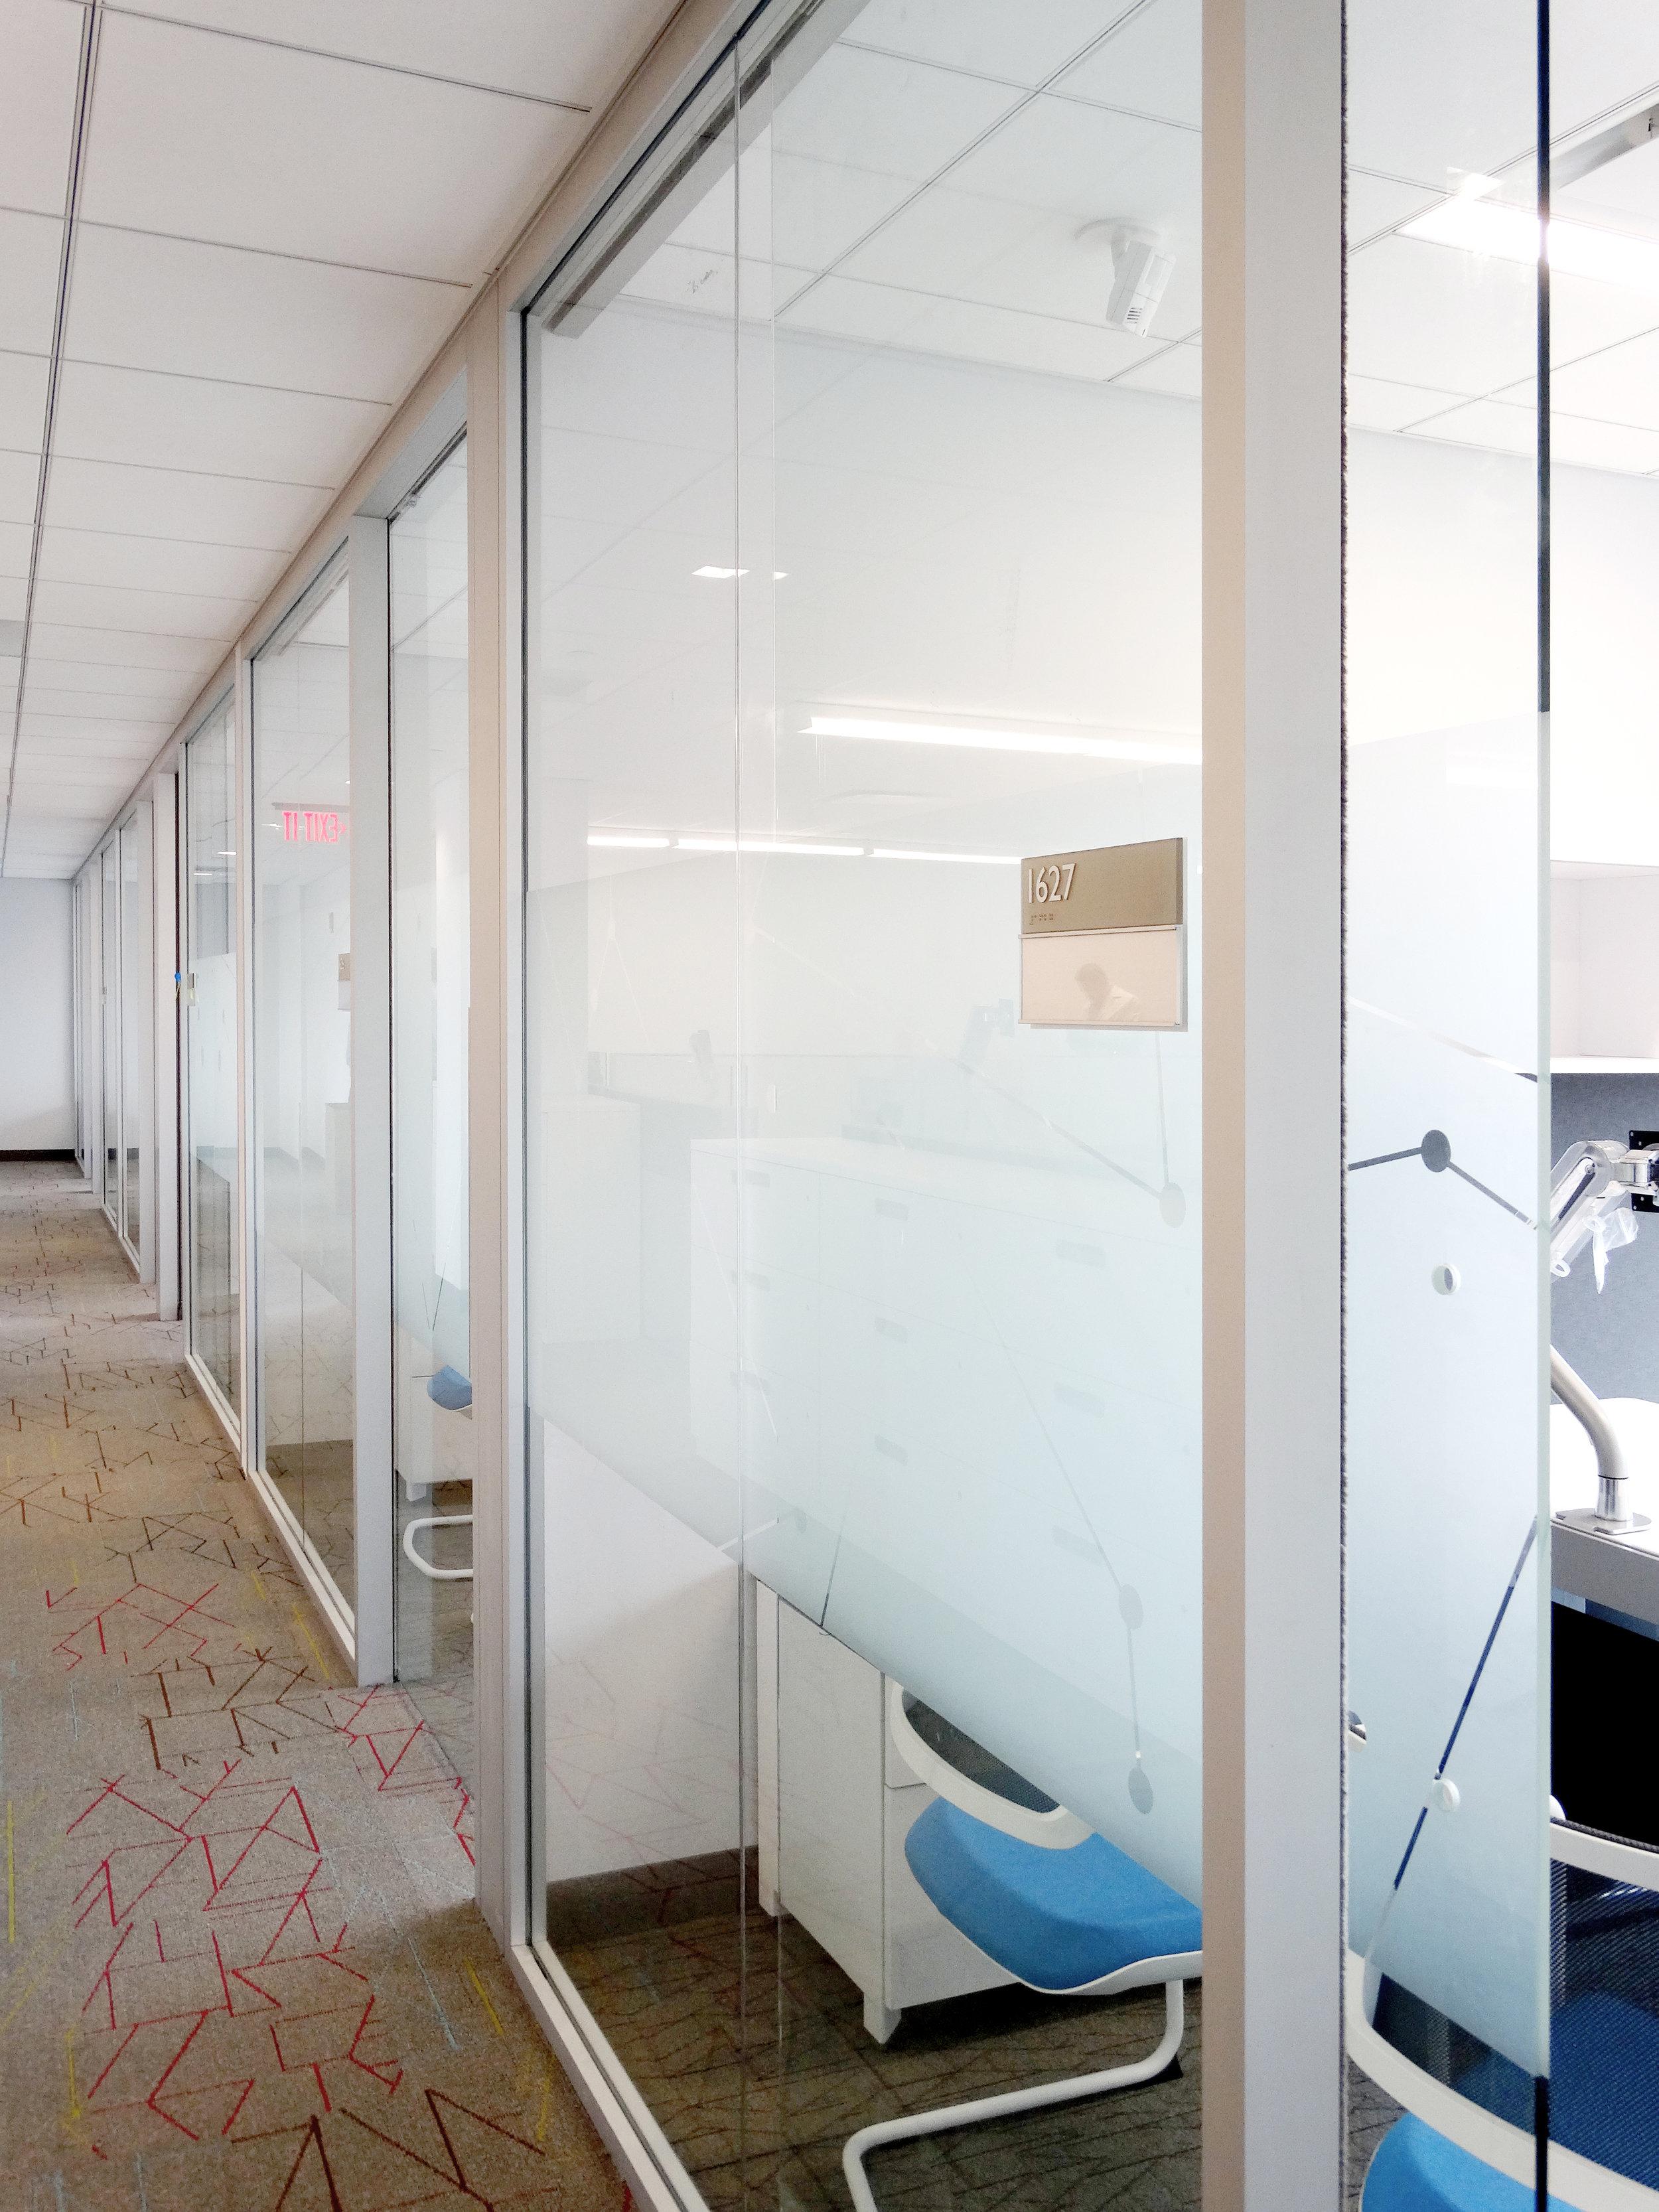 Litespace Aluminum Drywall Post Demountable System - Spaceworks AI.jpg